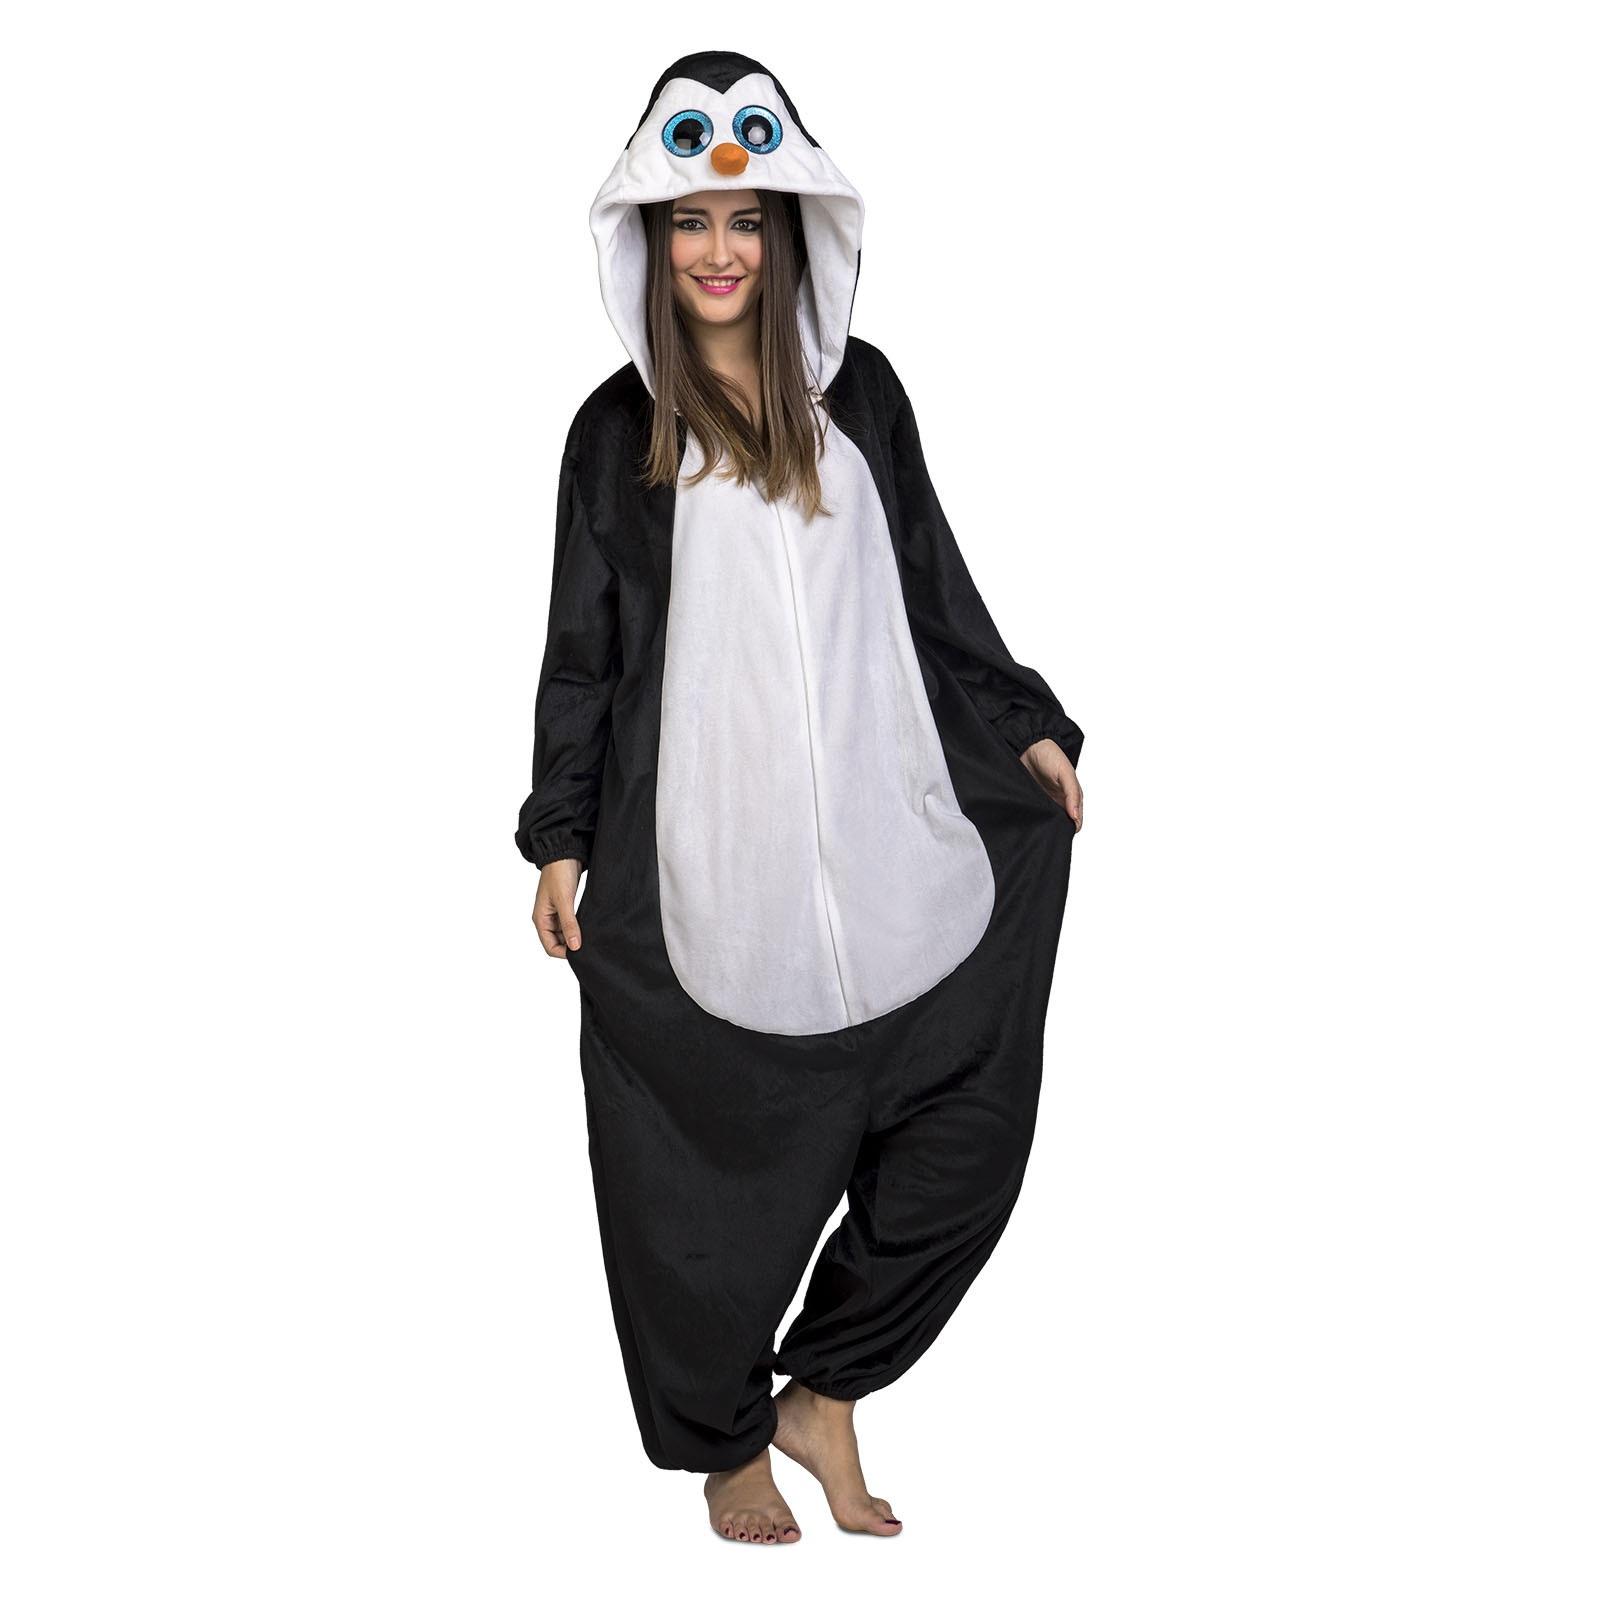 disfraz pingüino adulto - DISFRAZ DE PINGÜINO PIJAMA ADULTO